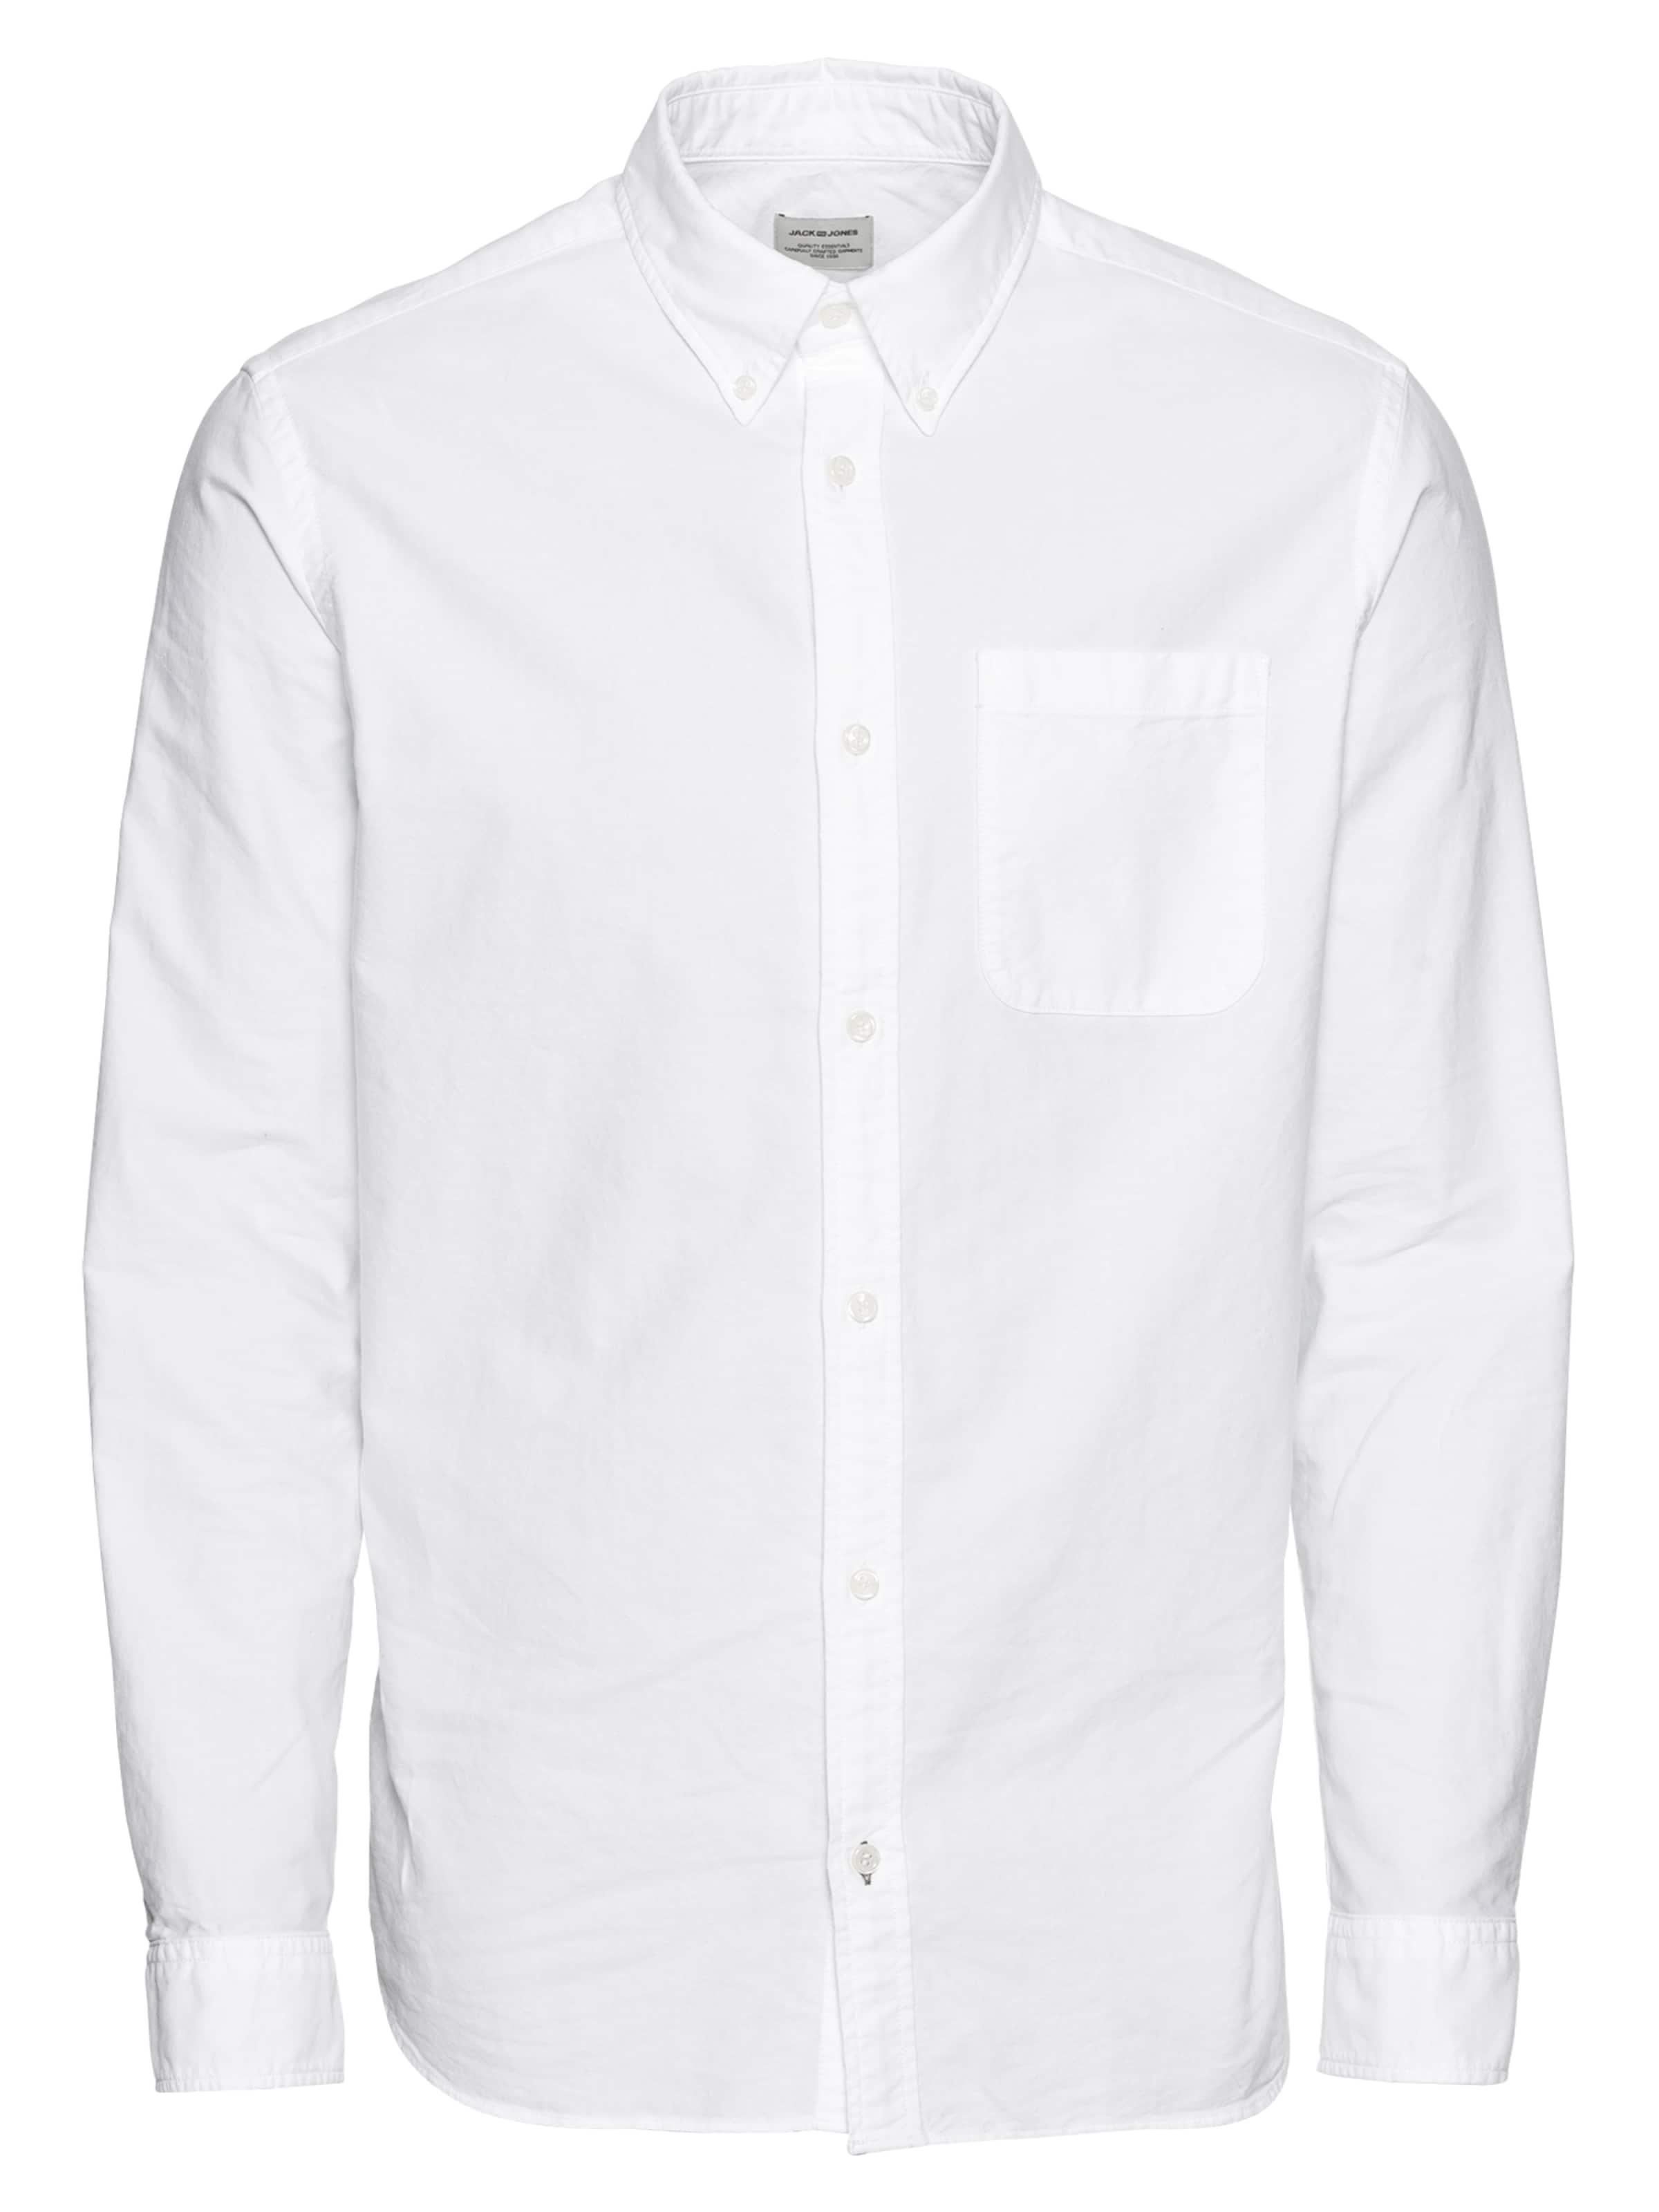 Jackamp; Weiß Herrenhemd Jones 'jjeoxford' In fgyb6vYI7m